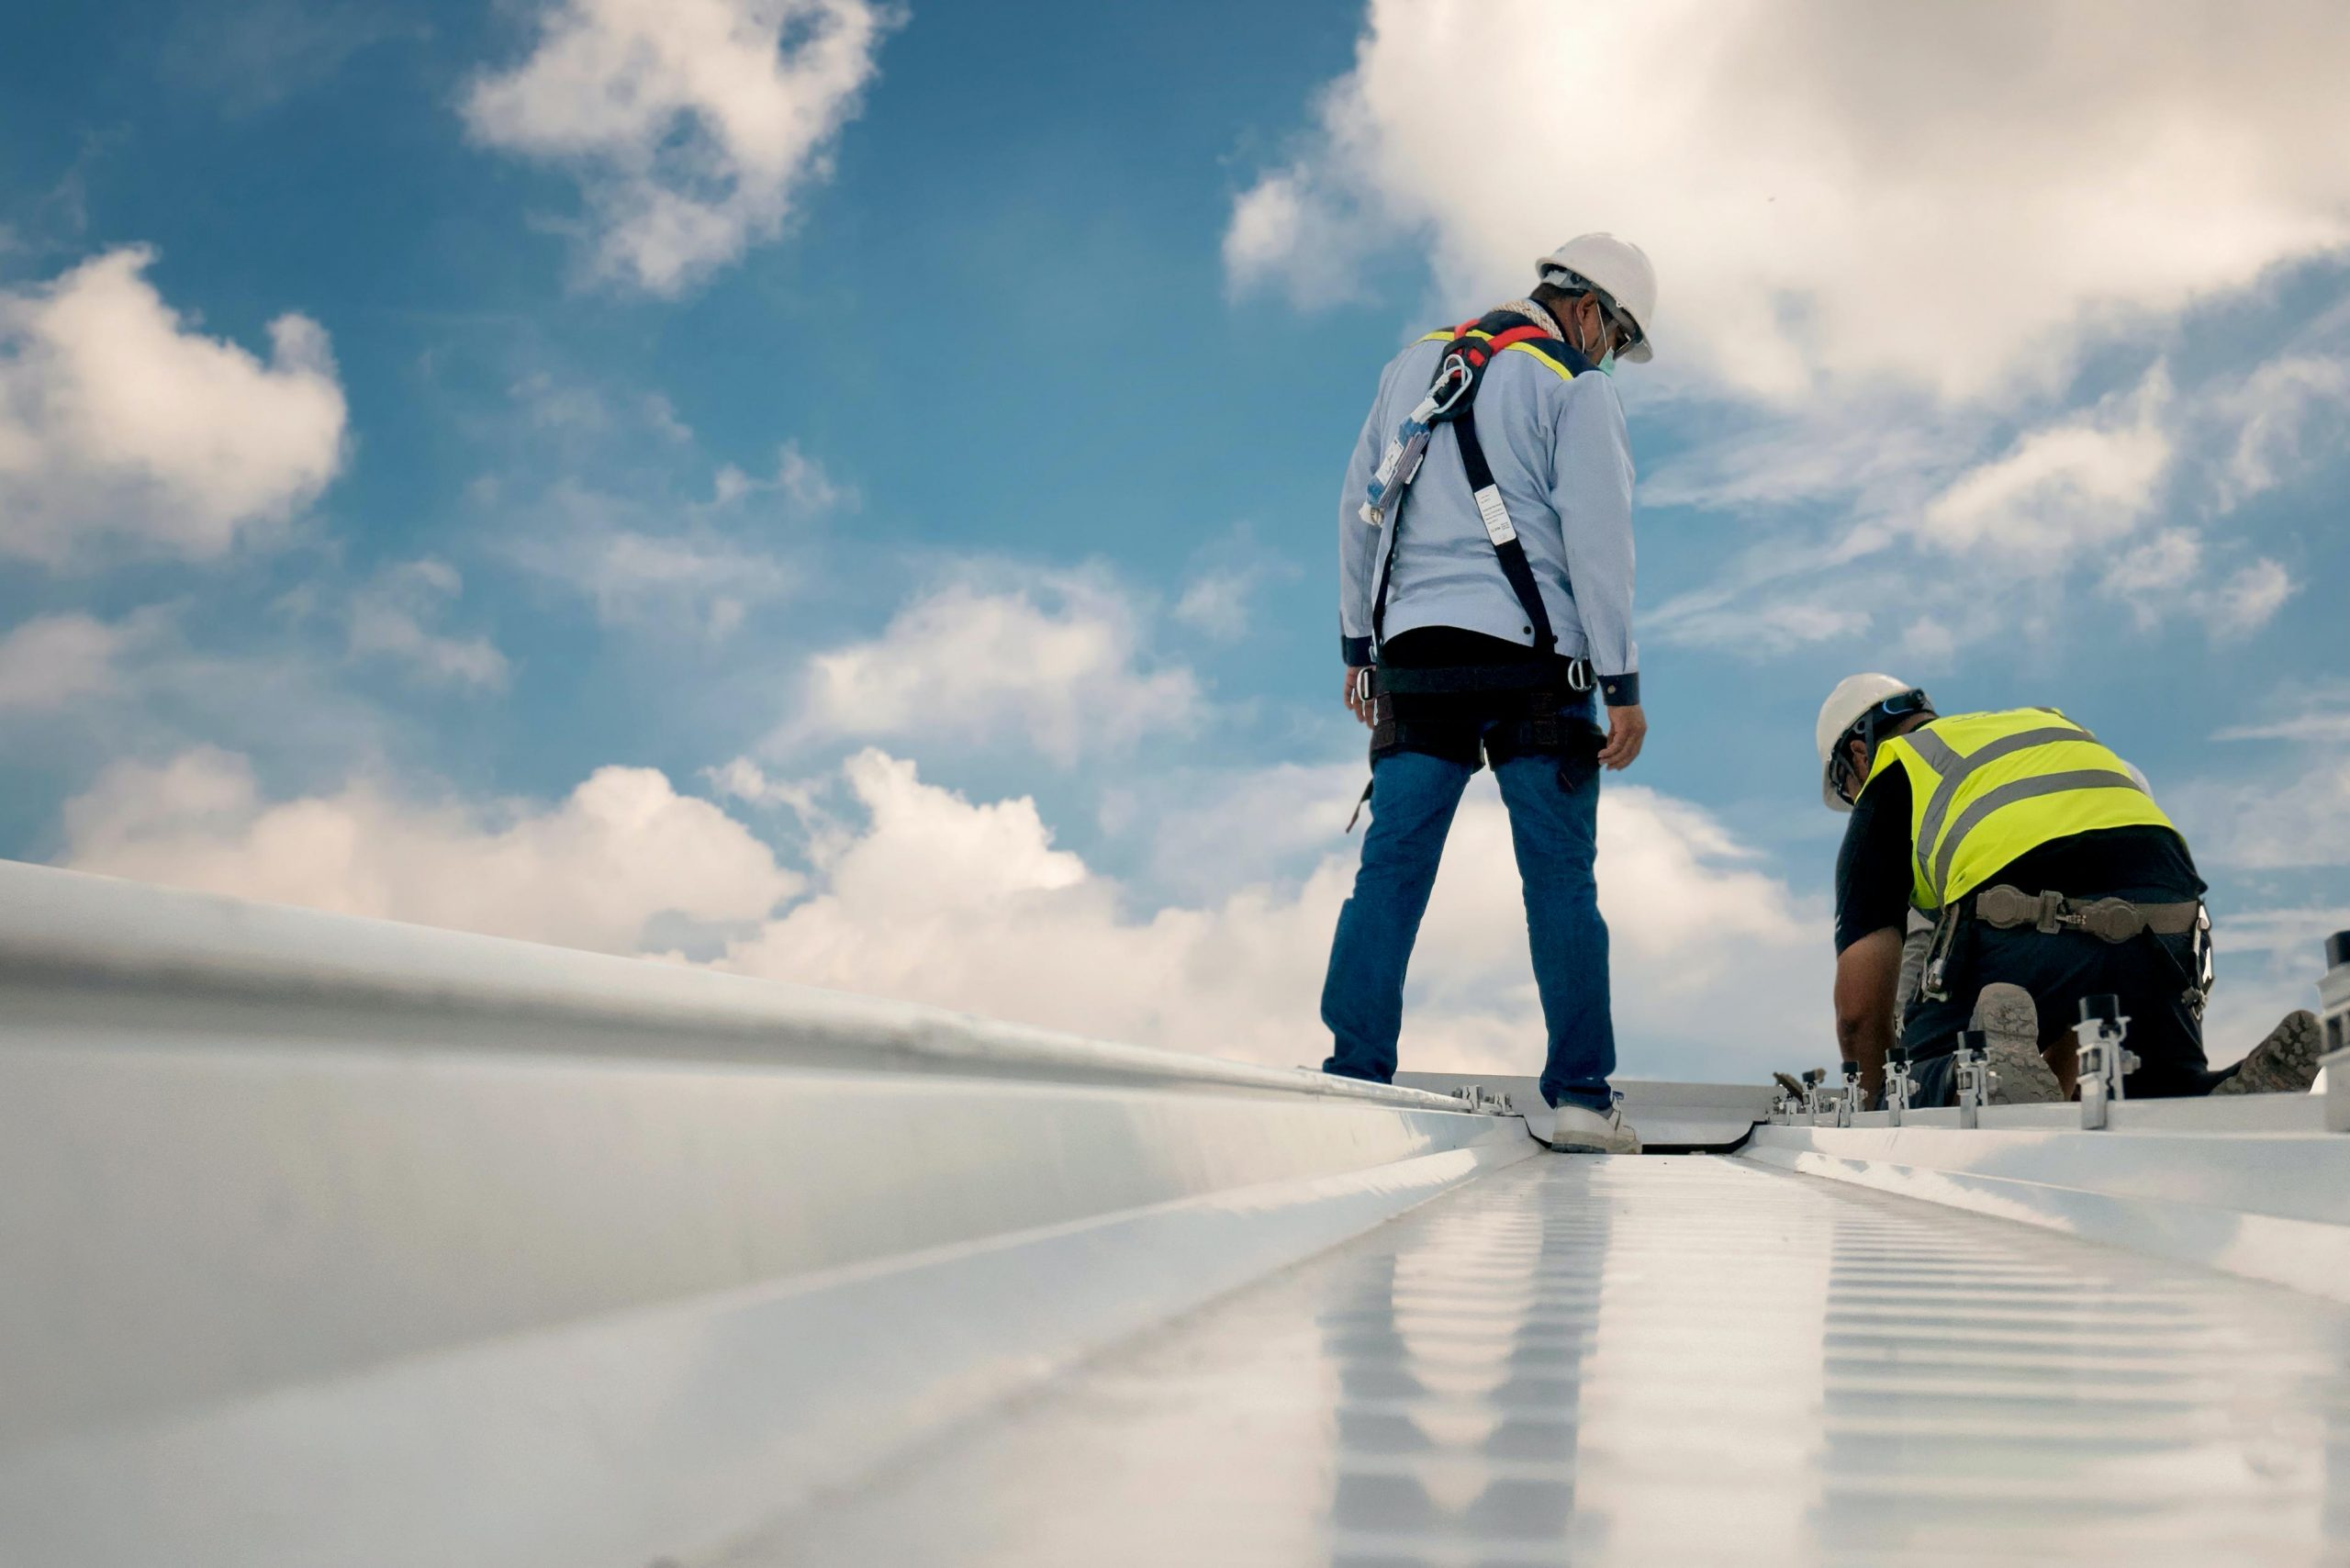 Olathe Roofing Company, Olathe Kansas Olathe Roofing Company, Roof Inspection